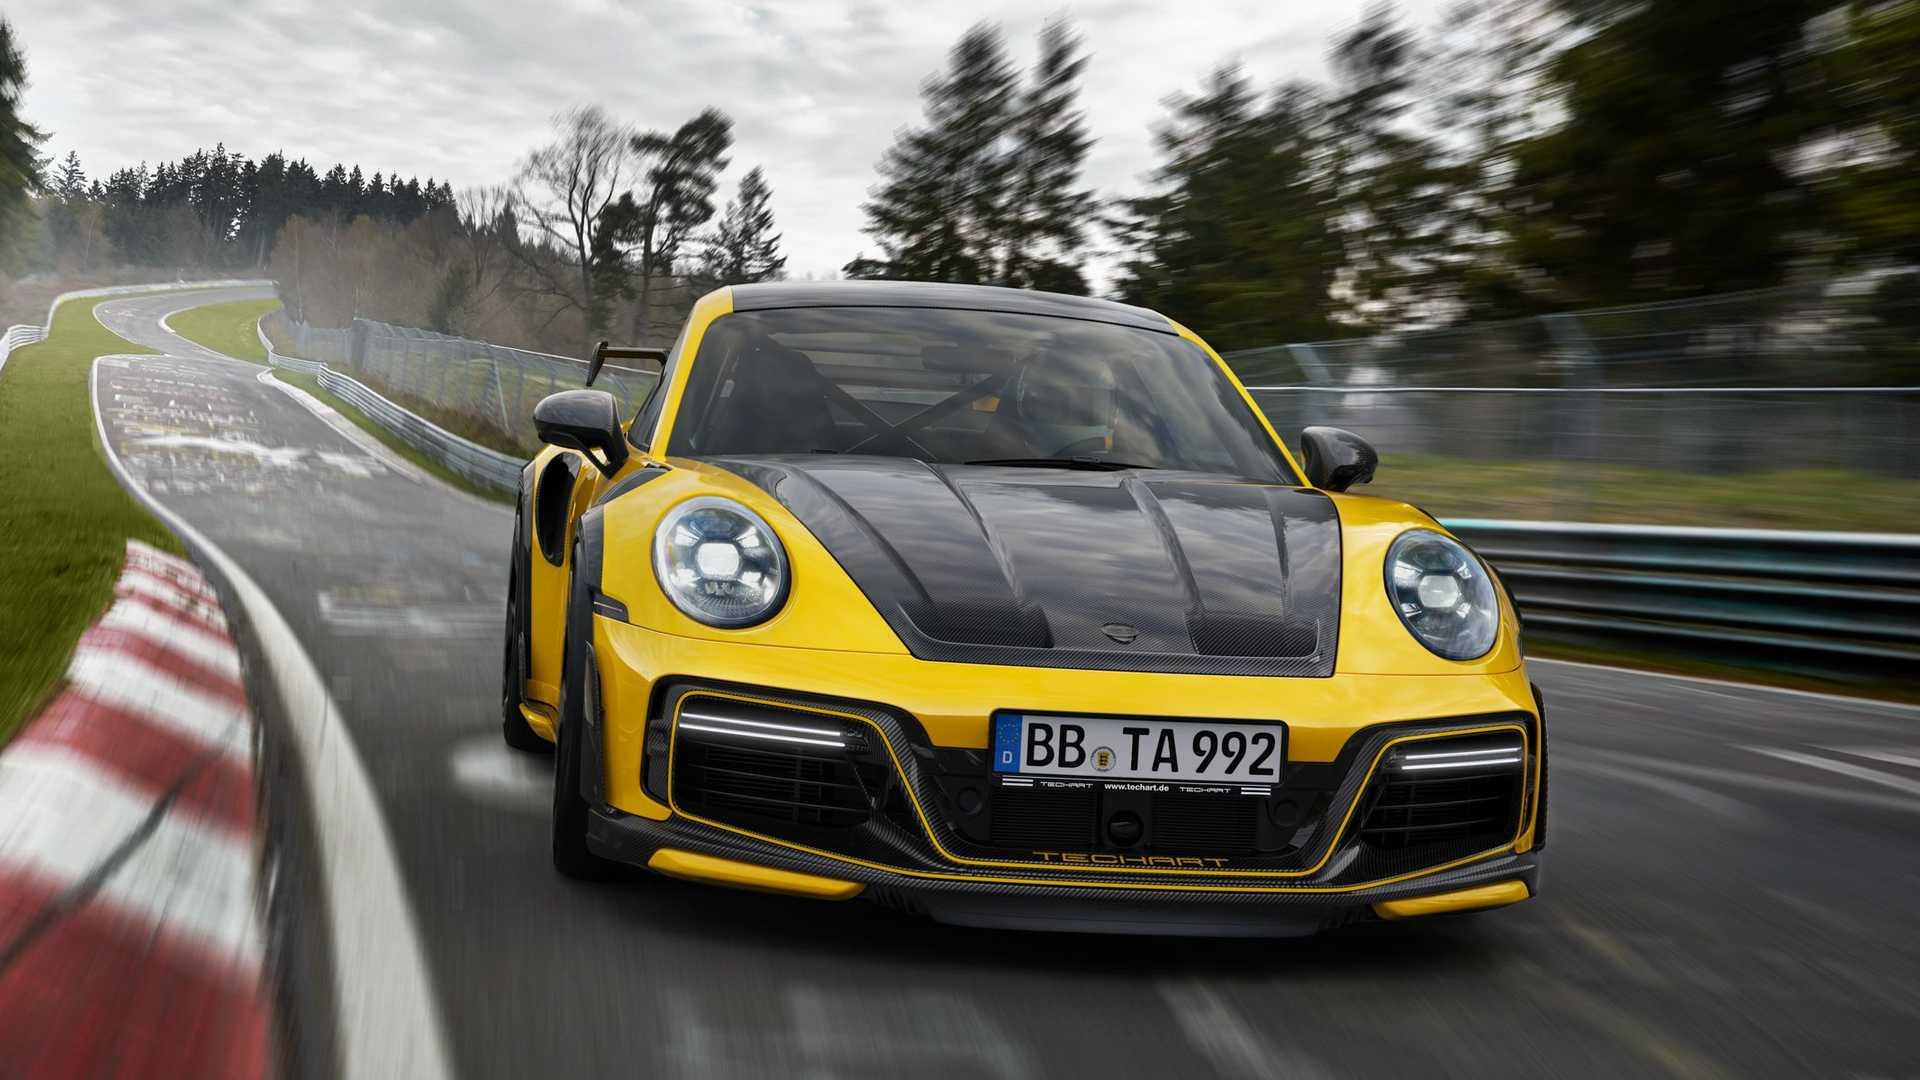 2021 Techart GT Street R is a tuned Porsche 911 Turbo that packs 800 hp